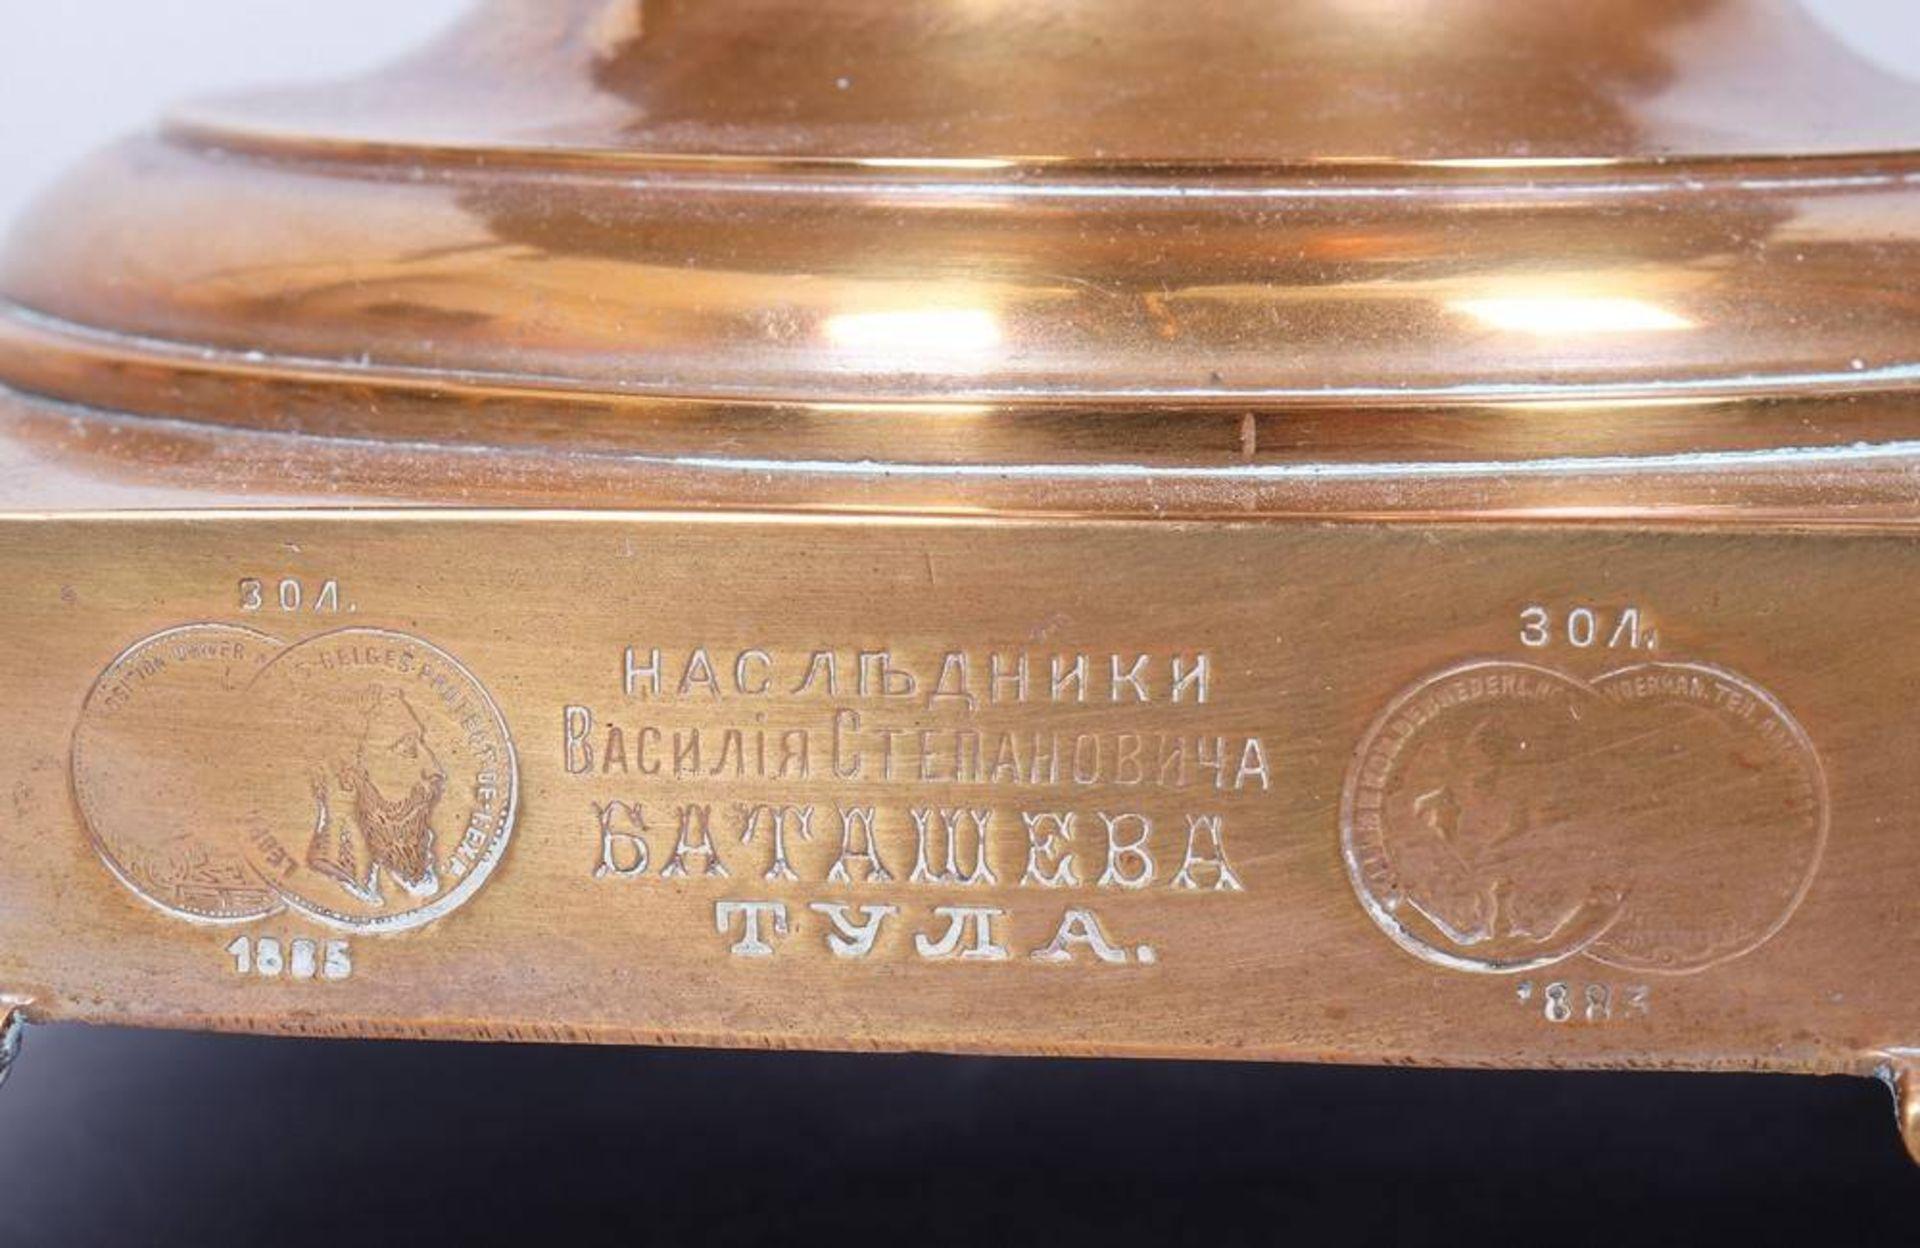 Großer Samowar, Bataschew, Tula, Russland, Ende 19.Jh. - Bild 4 aus 4